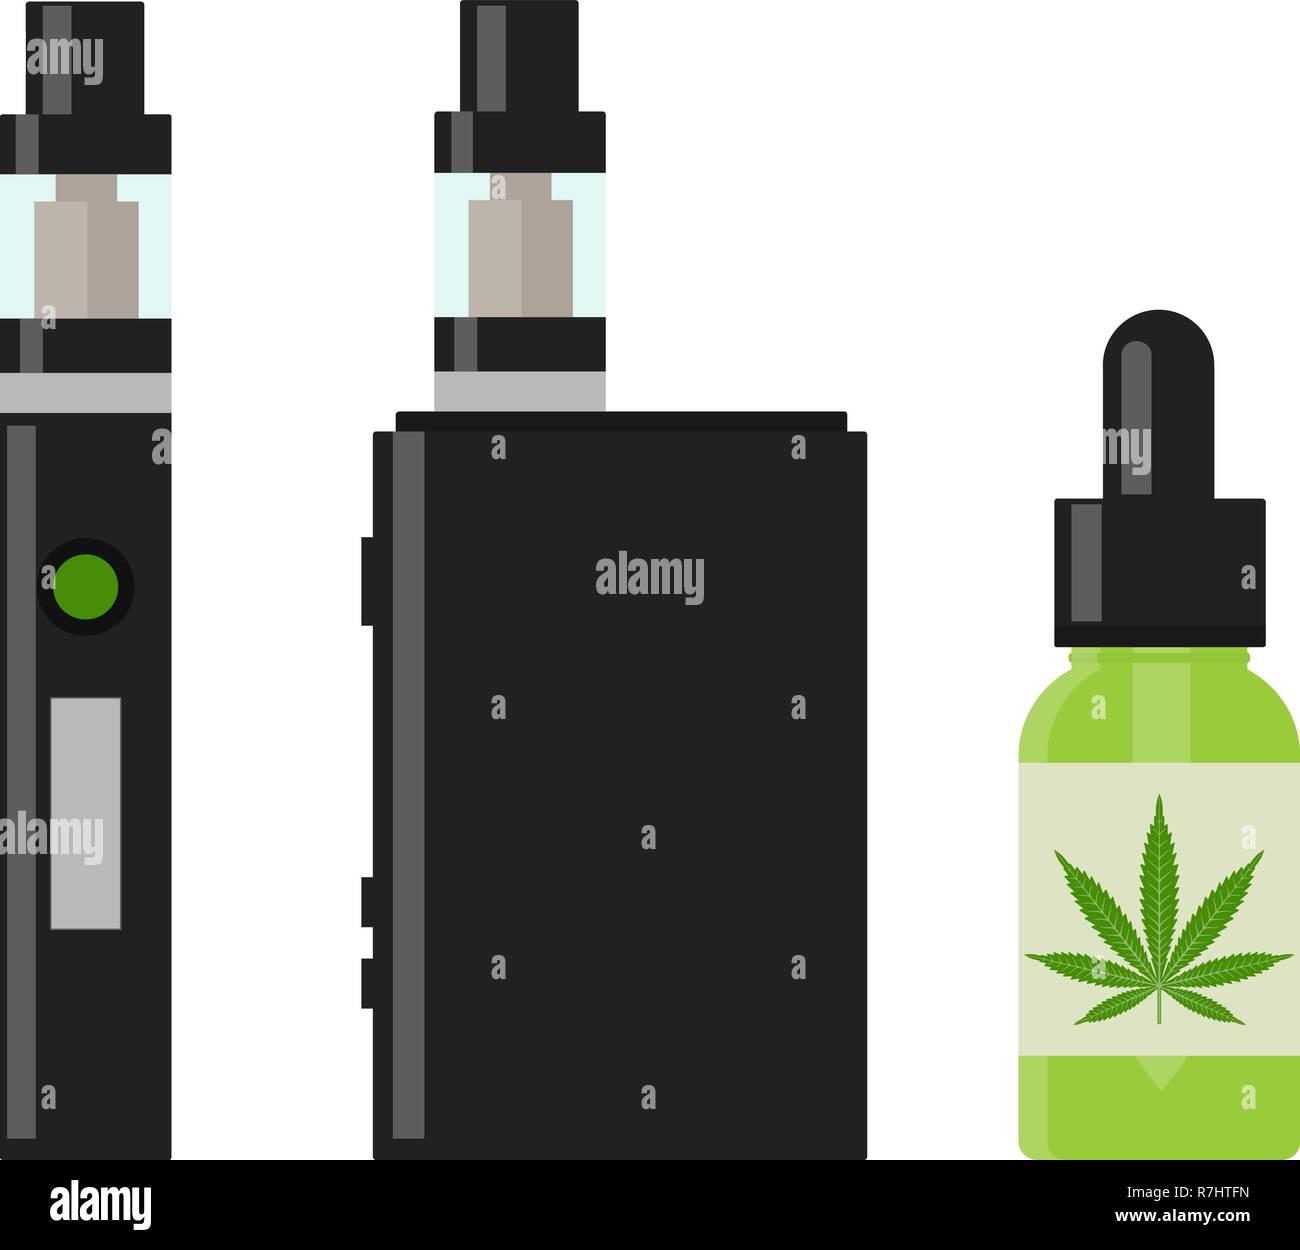 Marijuana Cannabis liquid for Vaping. Vape Cannabis Oil. Cannabis vaporizer. E-cigarette for vaping. Isolated vector illustration on white background. - Stock Image